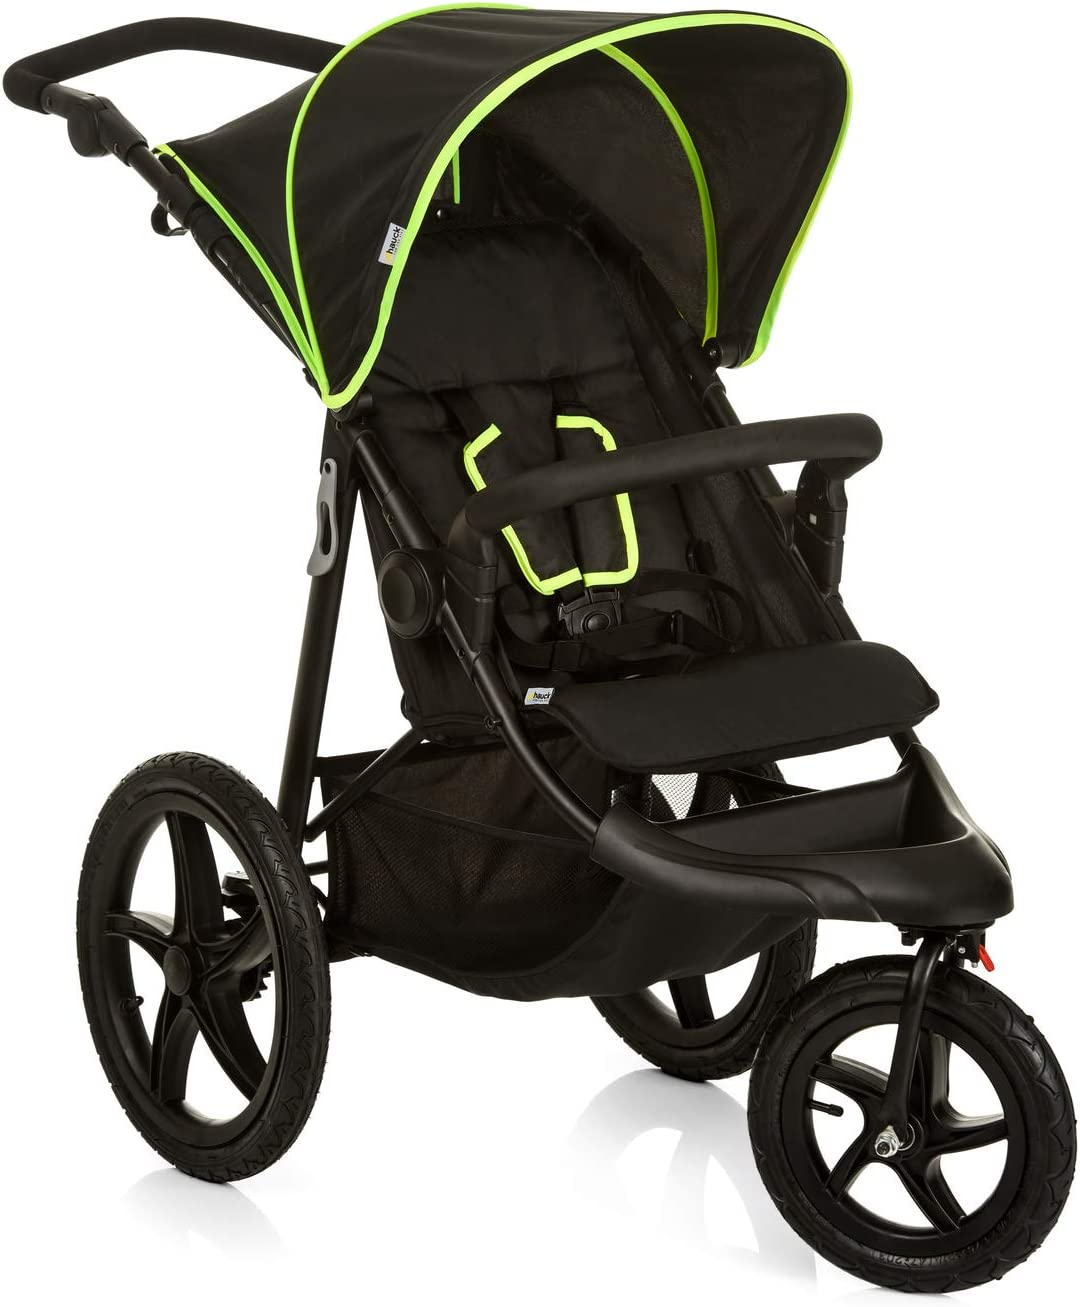 Hauck Runner - Silla de Paseo con 3 Ruedas Neumaticas, Plegado Compacto, Ruedas XL, con Camara de Aire, para Recien Nacidos, apto para Niños hasta 25kg, color Negro (Black Neon Yellow)